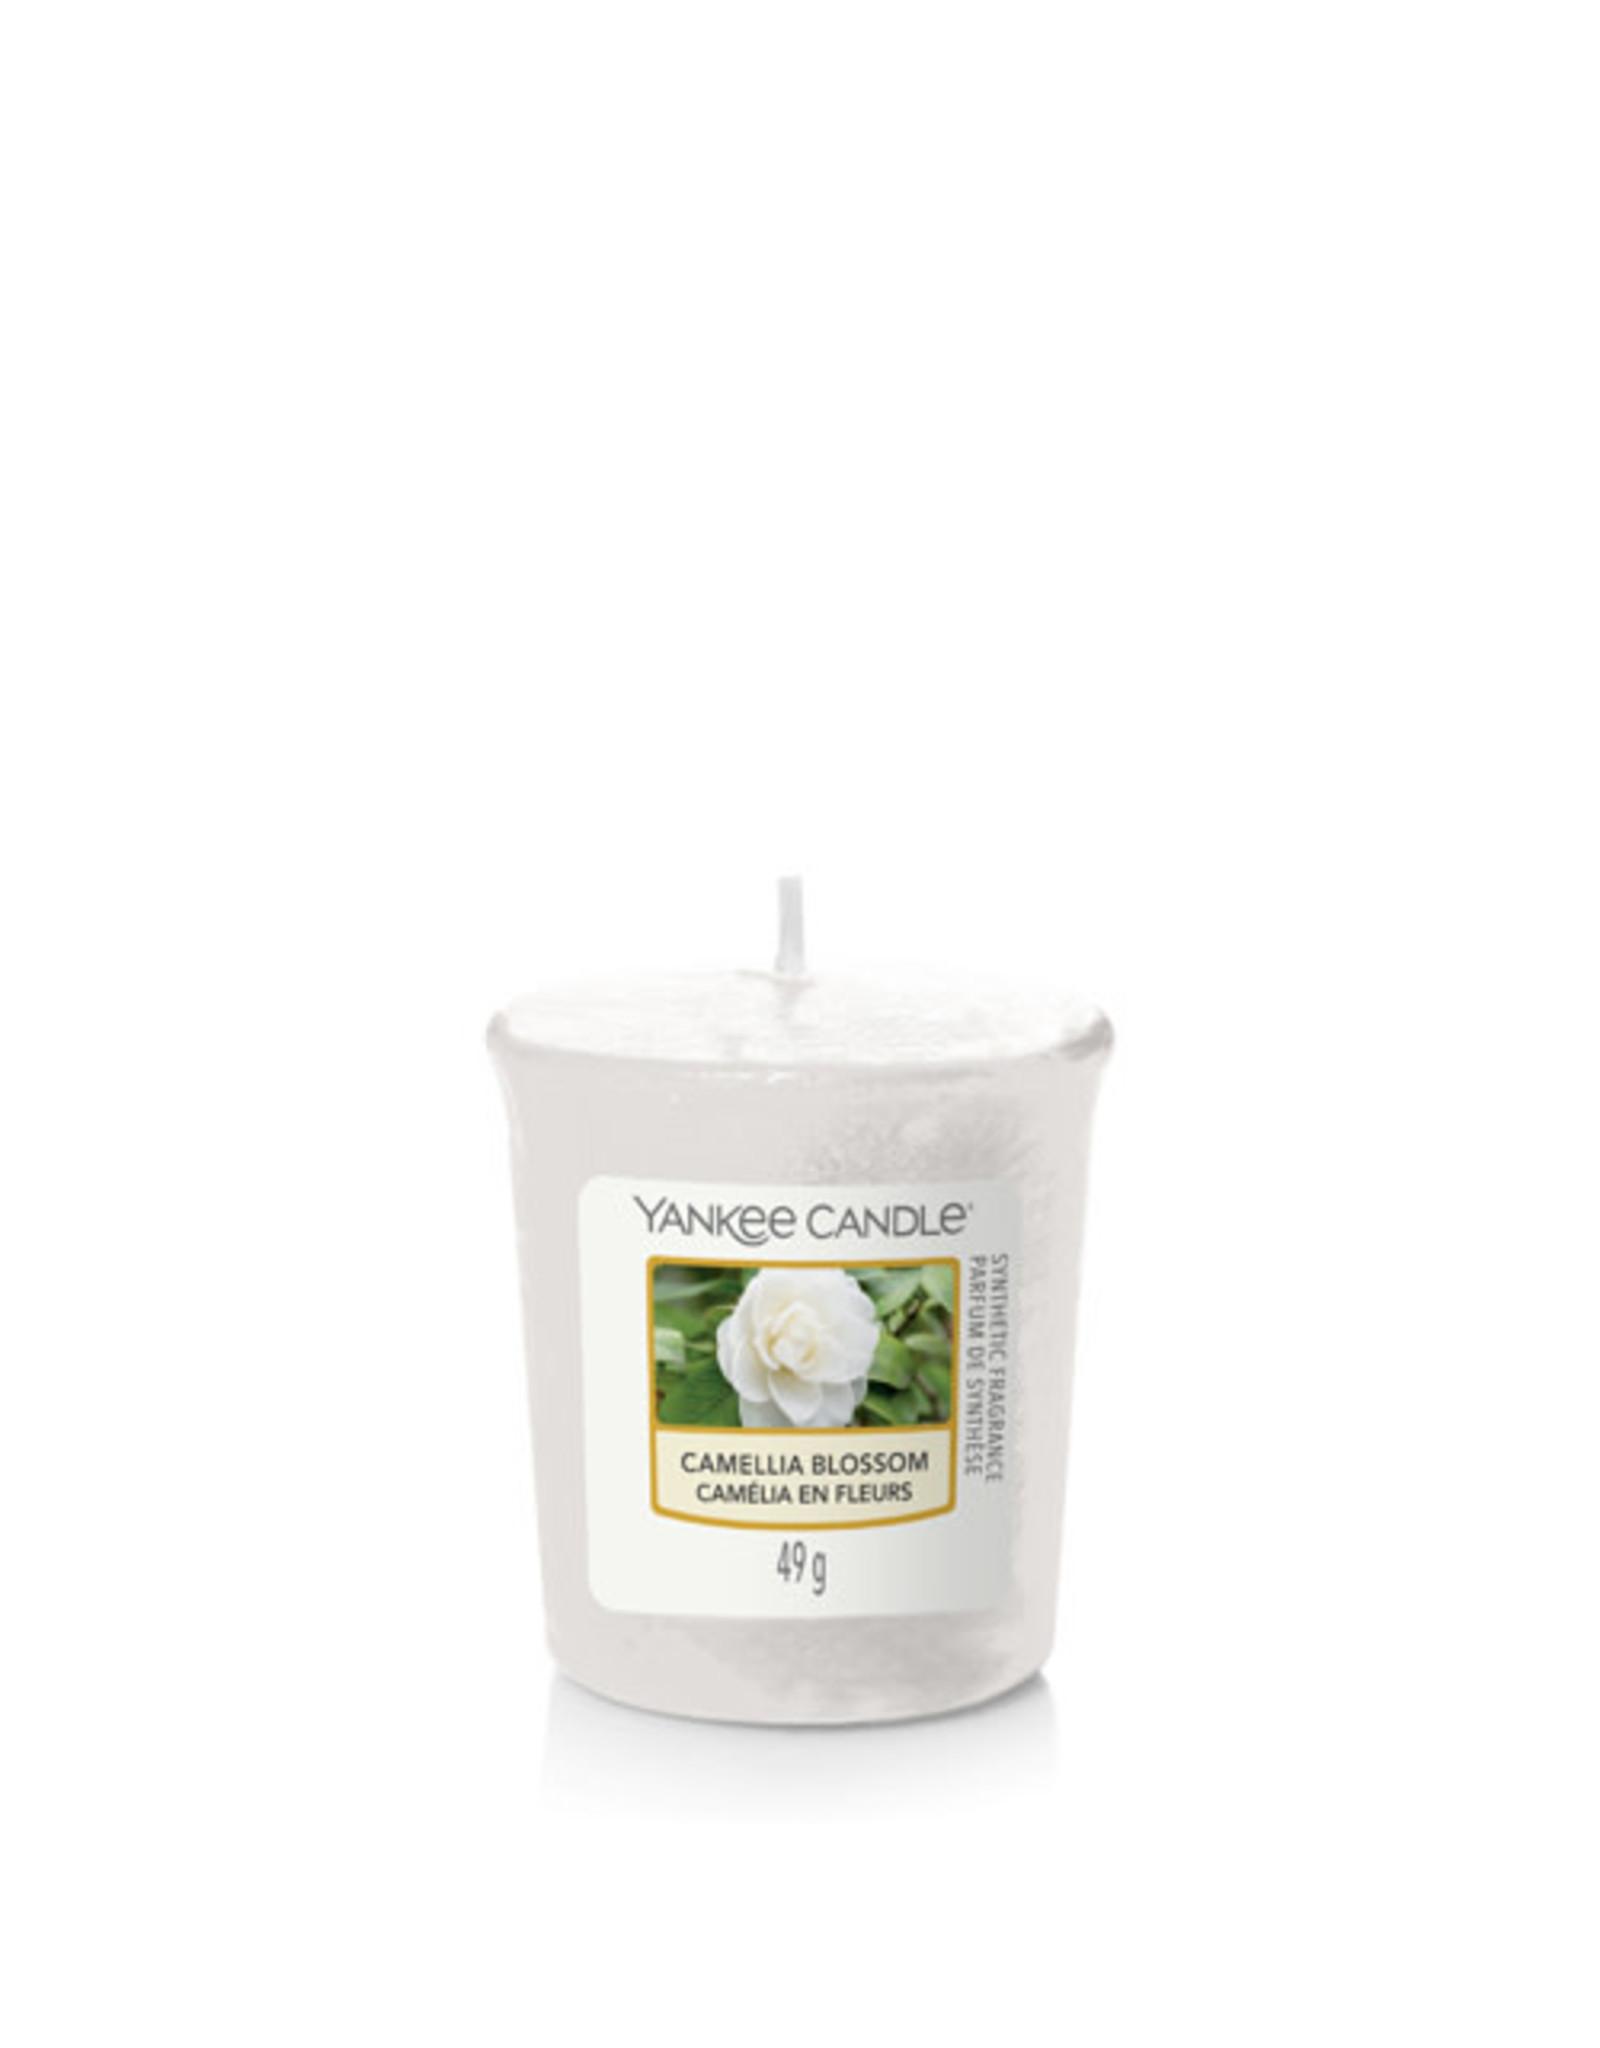 Yankee Candle Camellia Blossom Votive